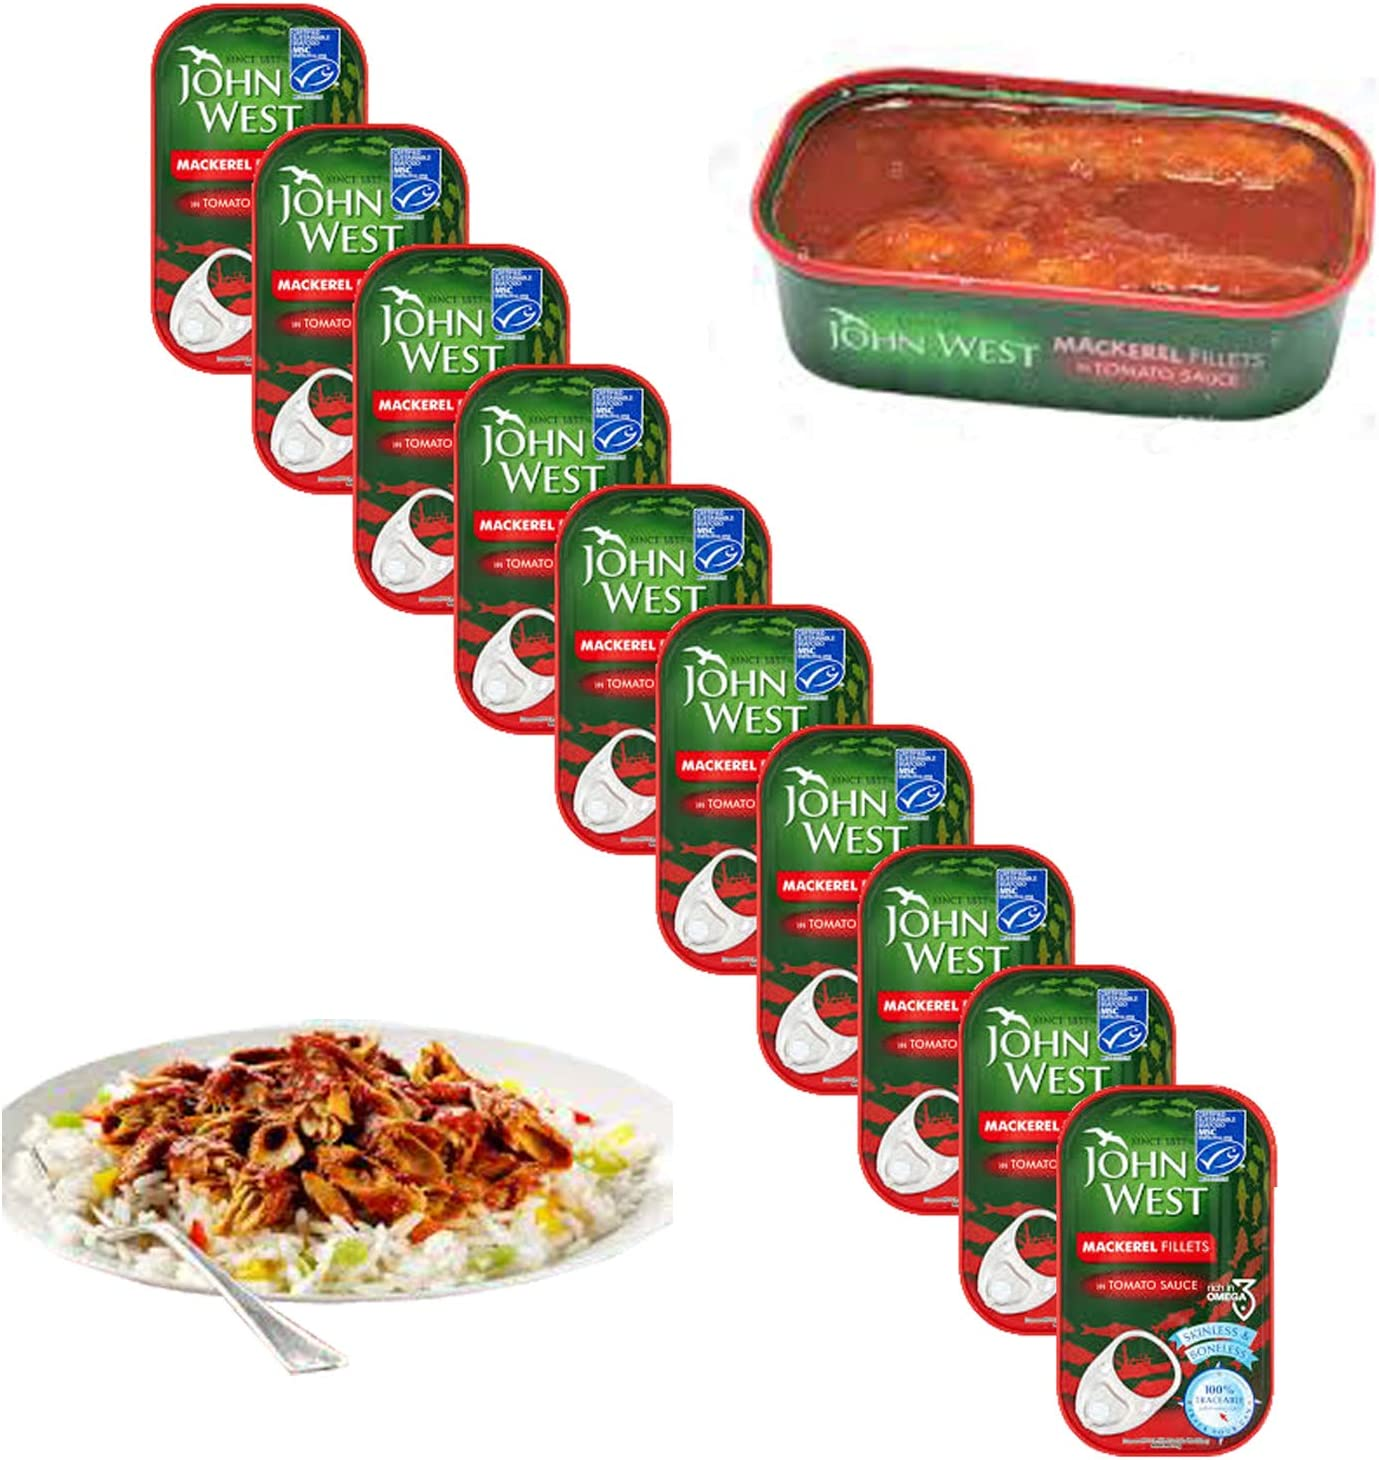 John West - Filetes de caballa en salsa de tomate (10 unidades)